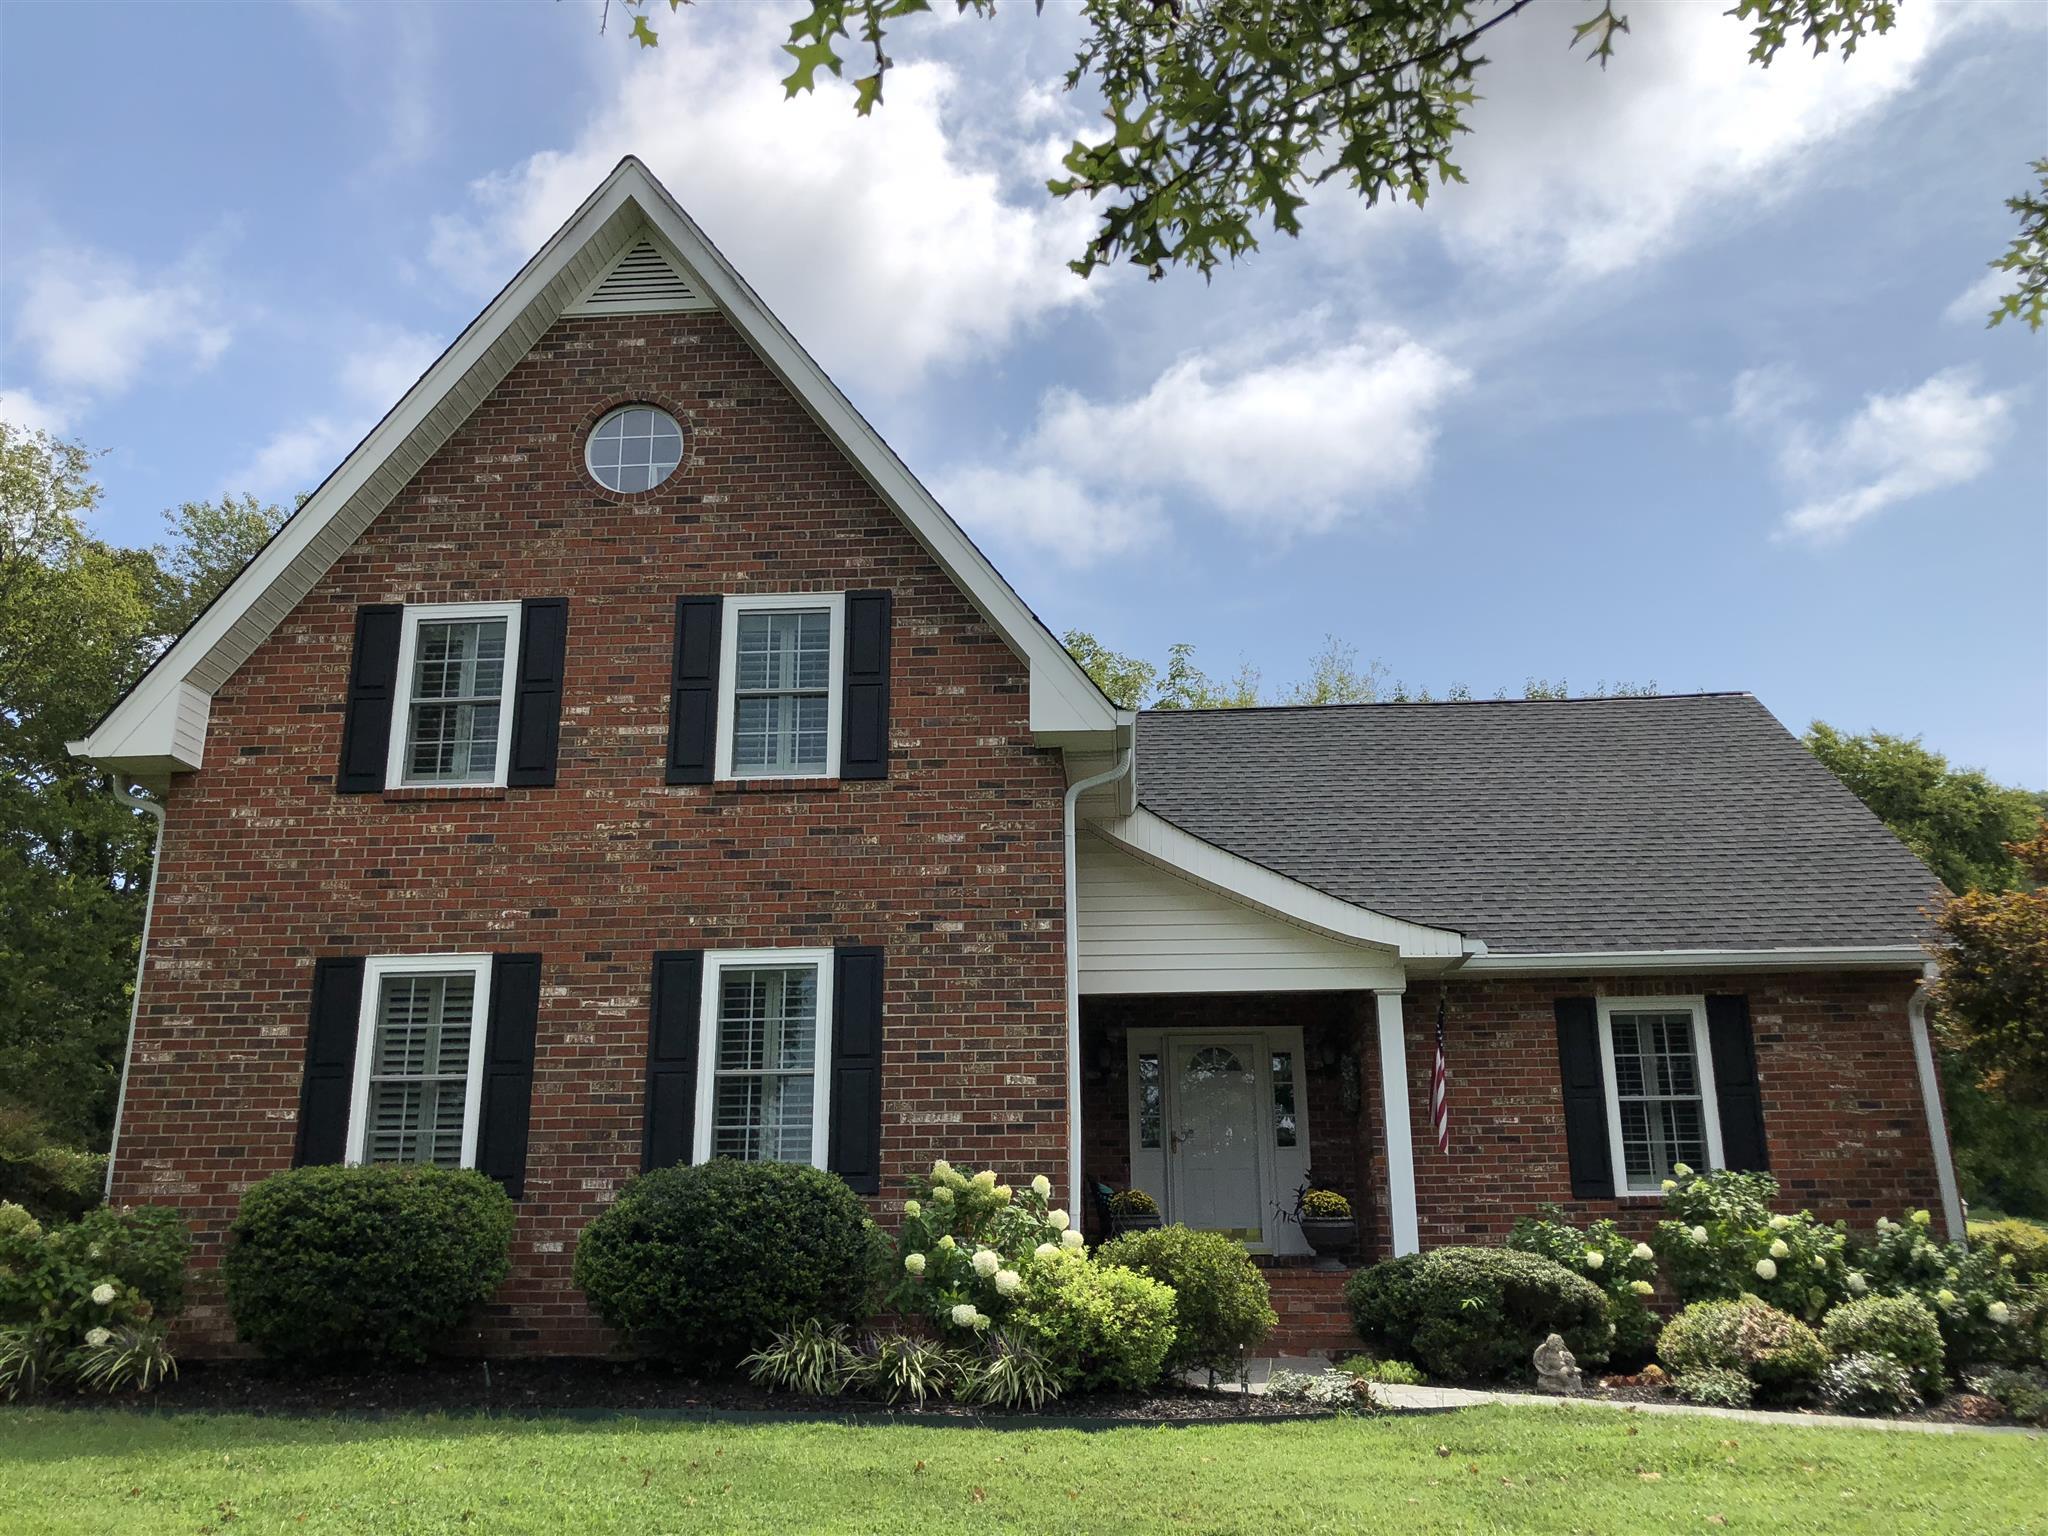 193 Alexandria Hwy, Brush Creek, TN 38547 - Brush Creek, TN real estate listing